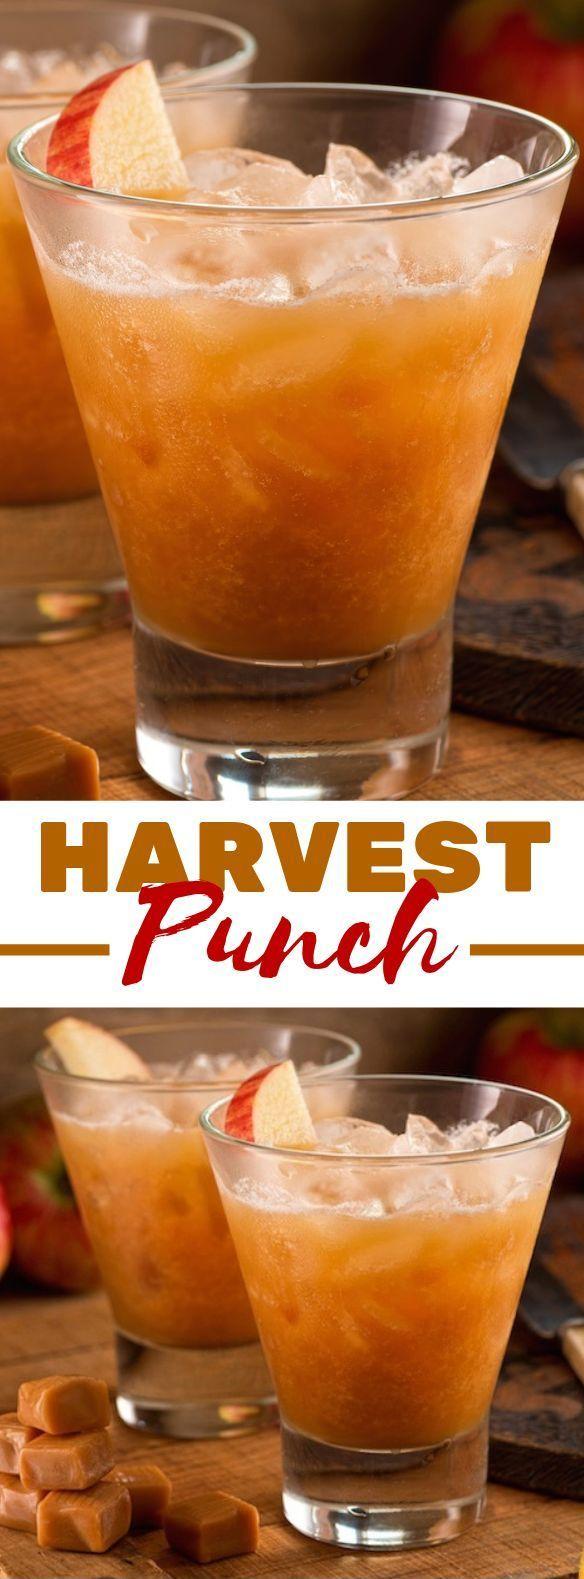 Das BESTE Fall Punch Rezept für Partys #drinks #falldrink #alcoholicpartydrinks